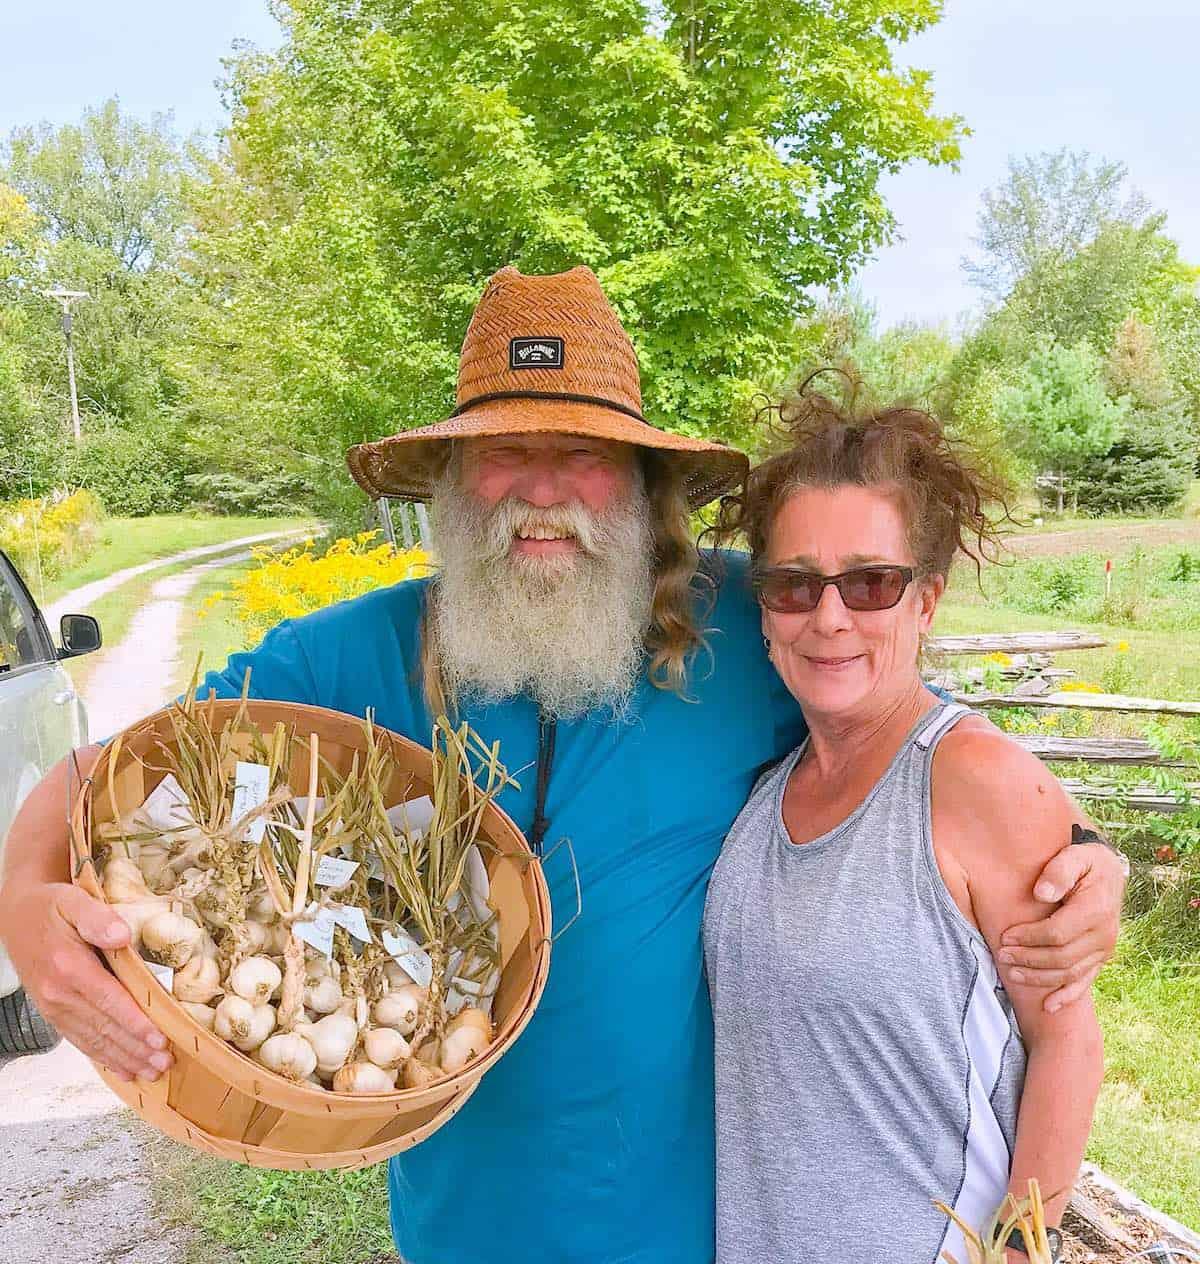 Randall Markewitz and Deborah Hanson of the Organic Garlic Farm Co.